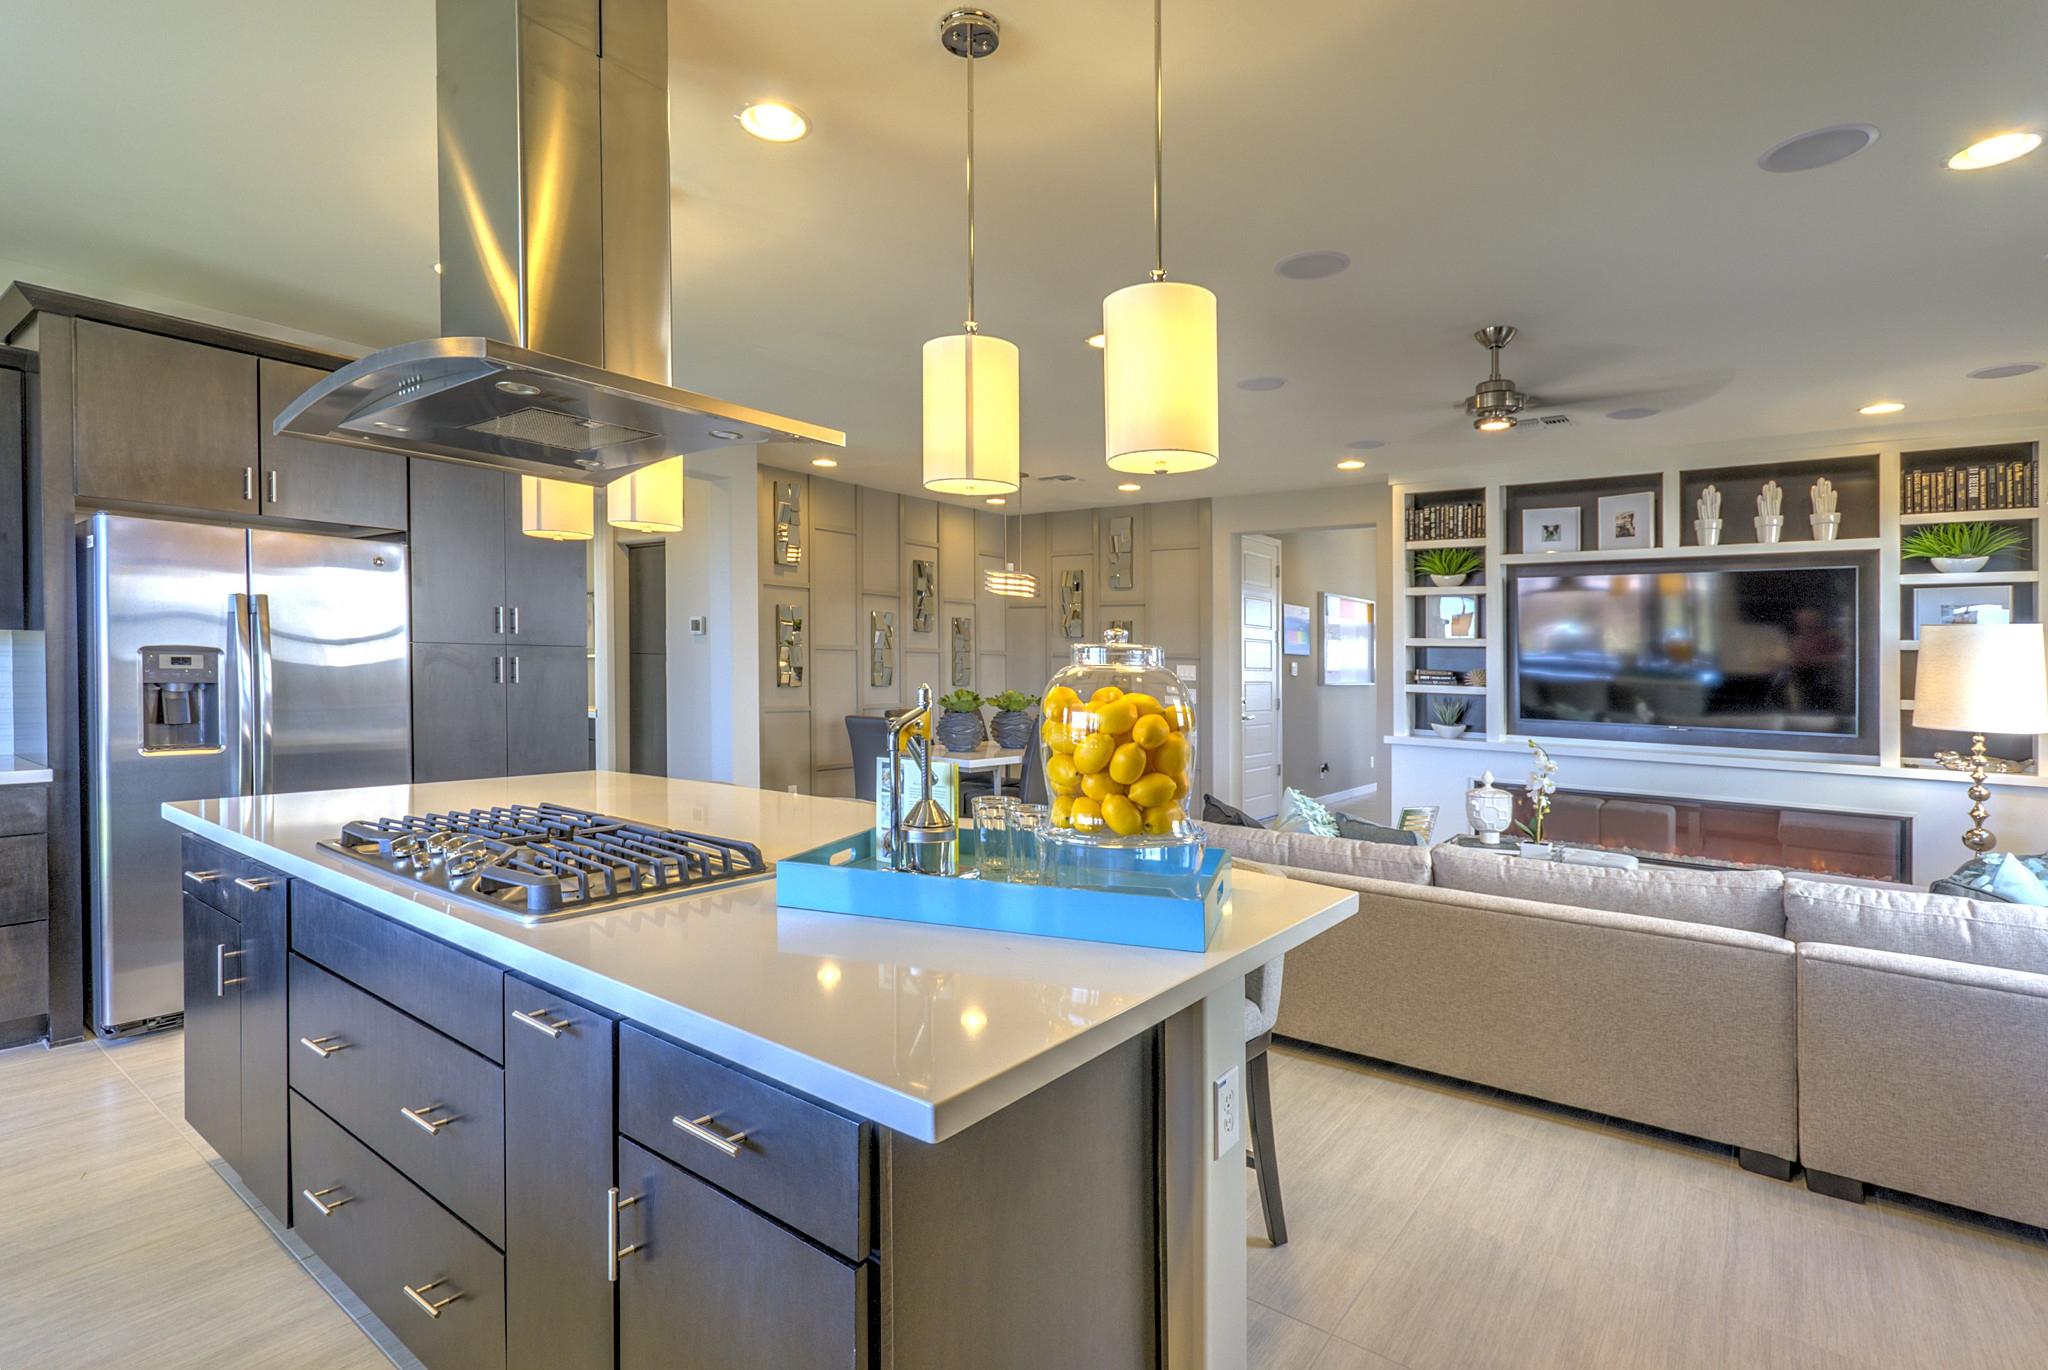 Ambition at Eastmark Hope Plan 3583 Kitchen